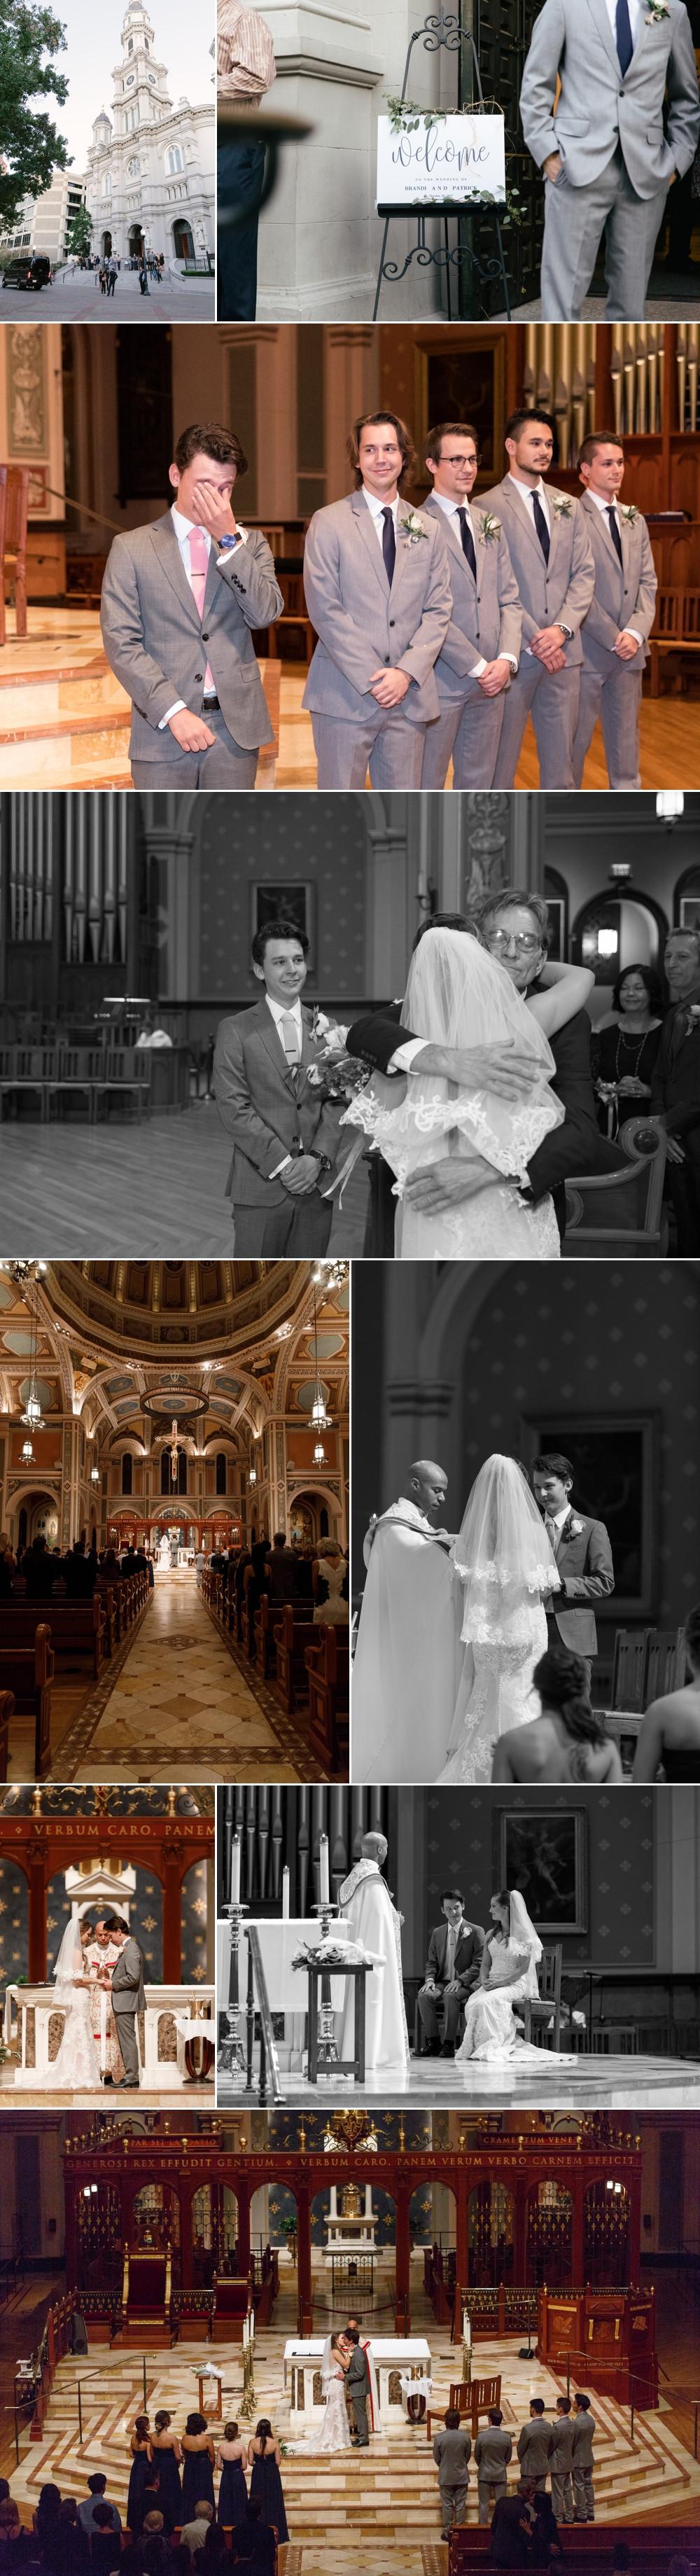 Sacramento Cathedral ceremony